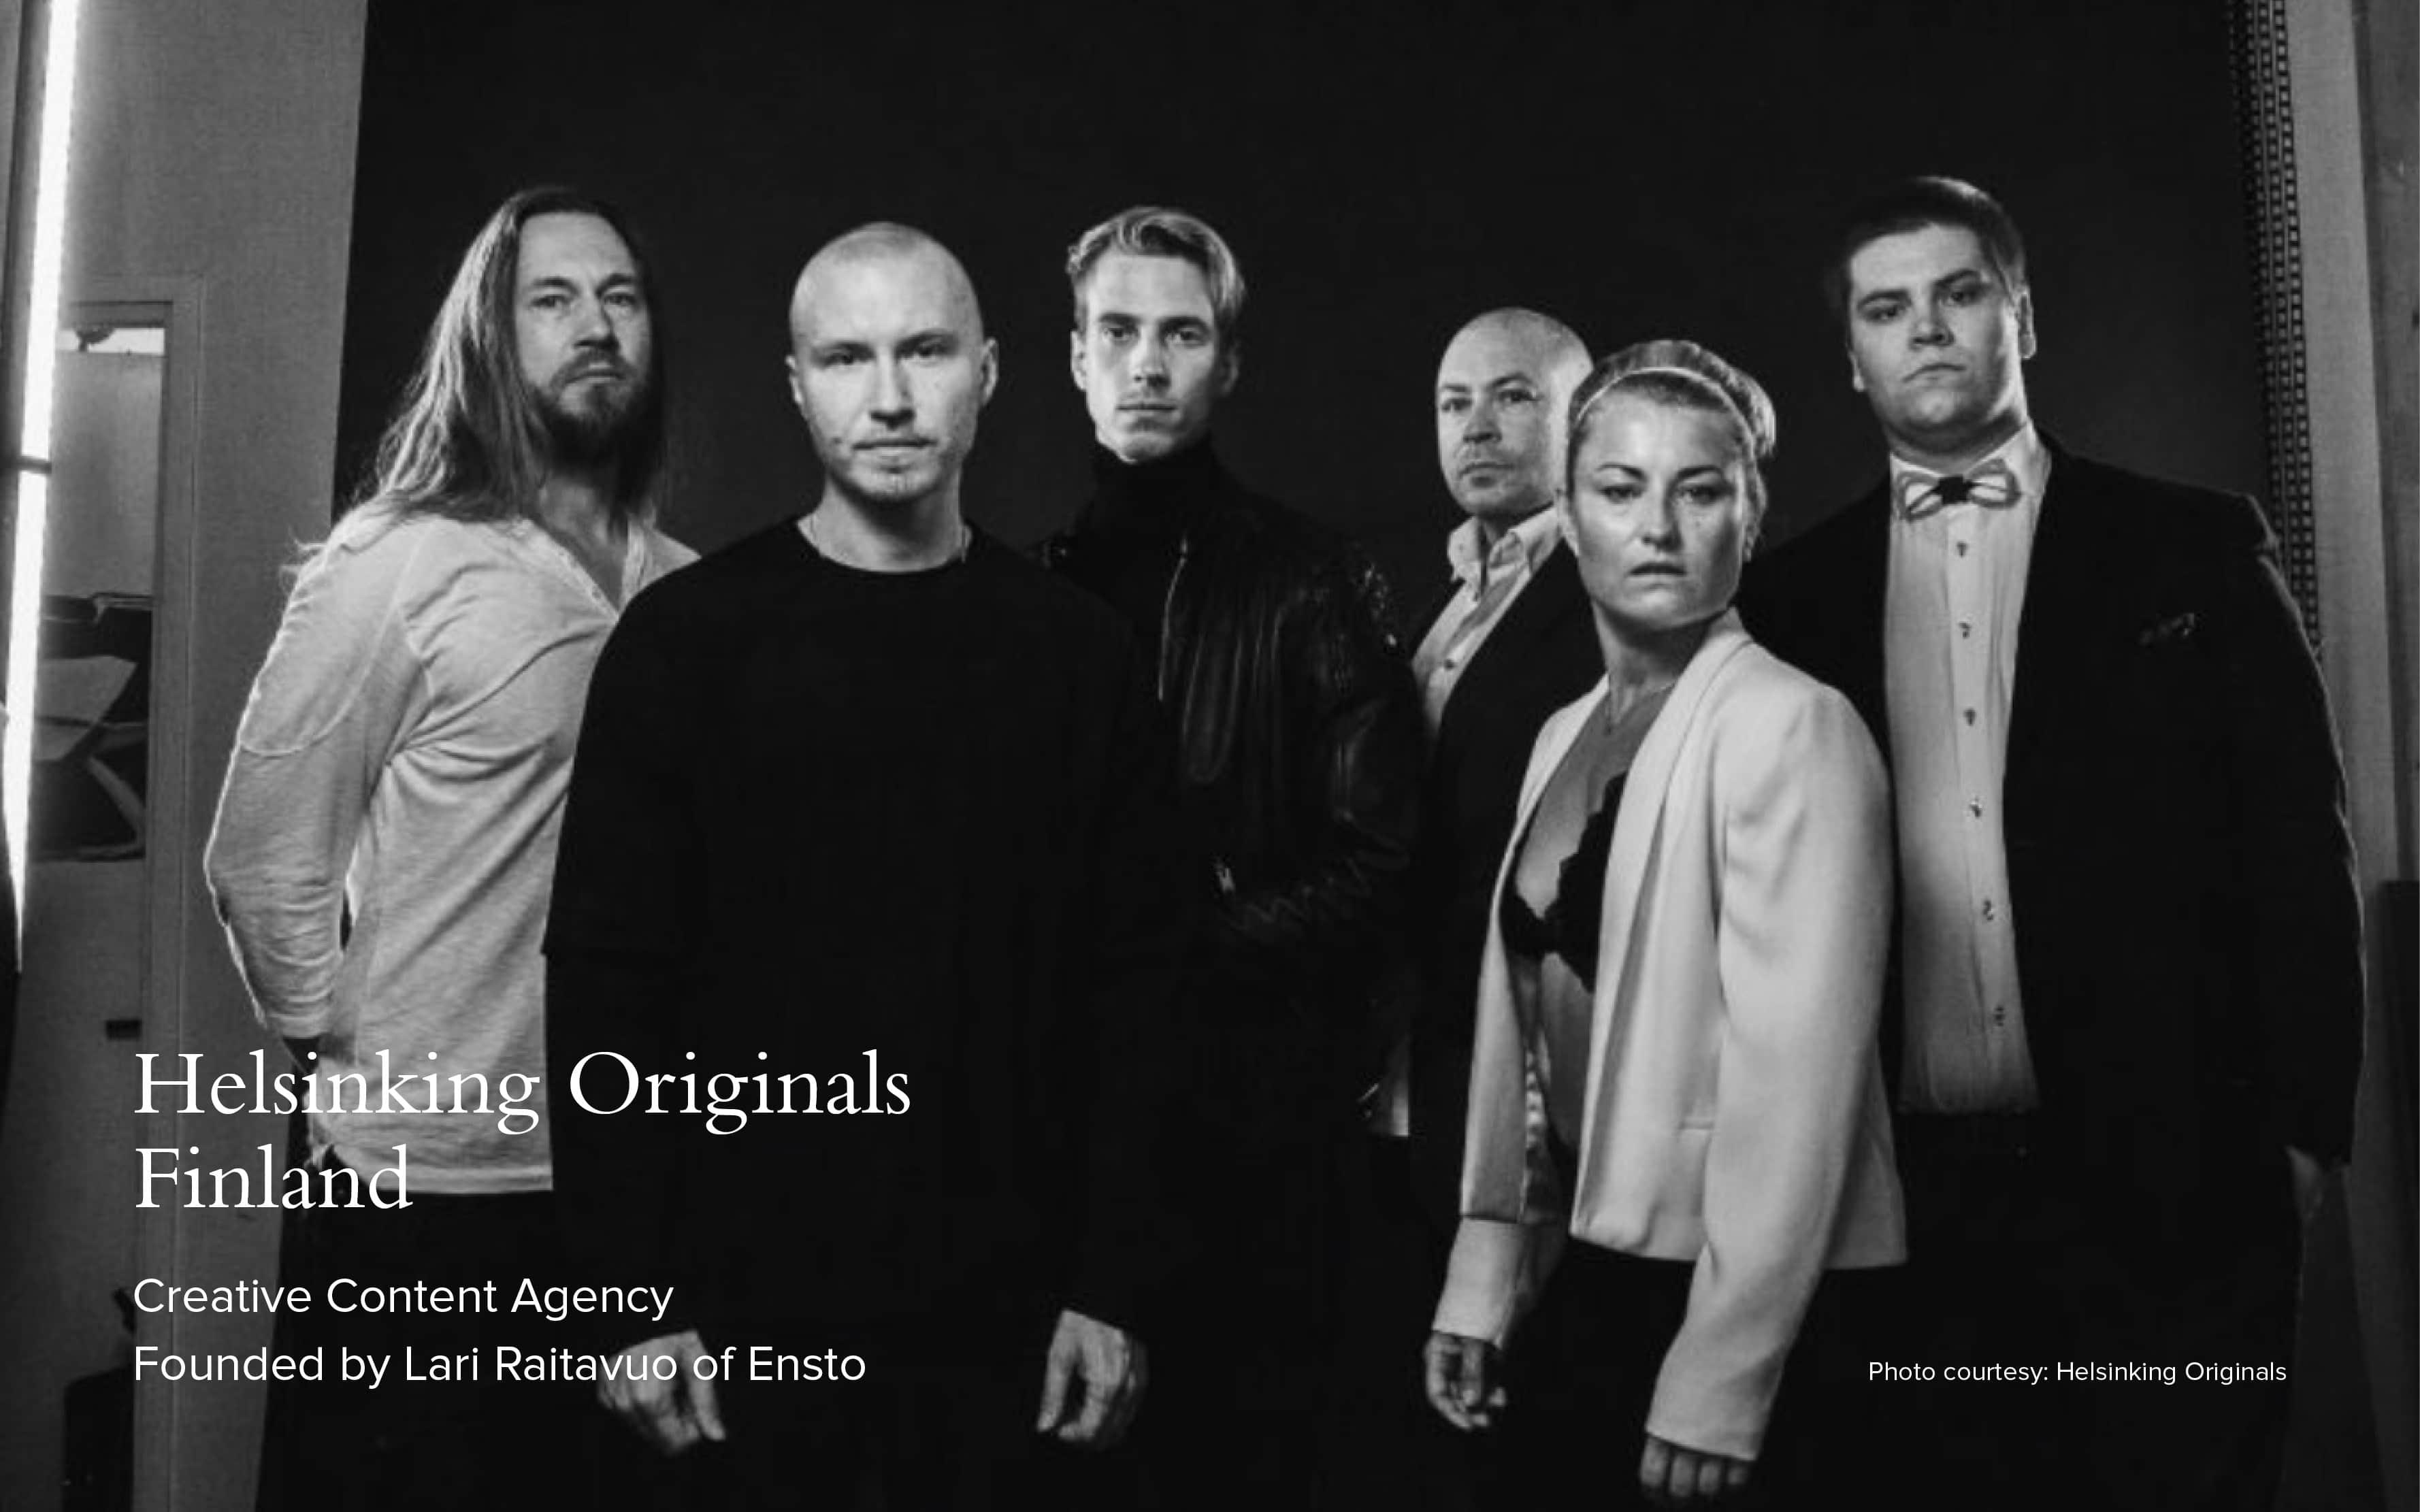 Helsinki Originals Finland family business